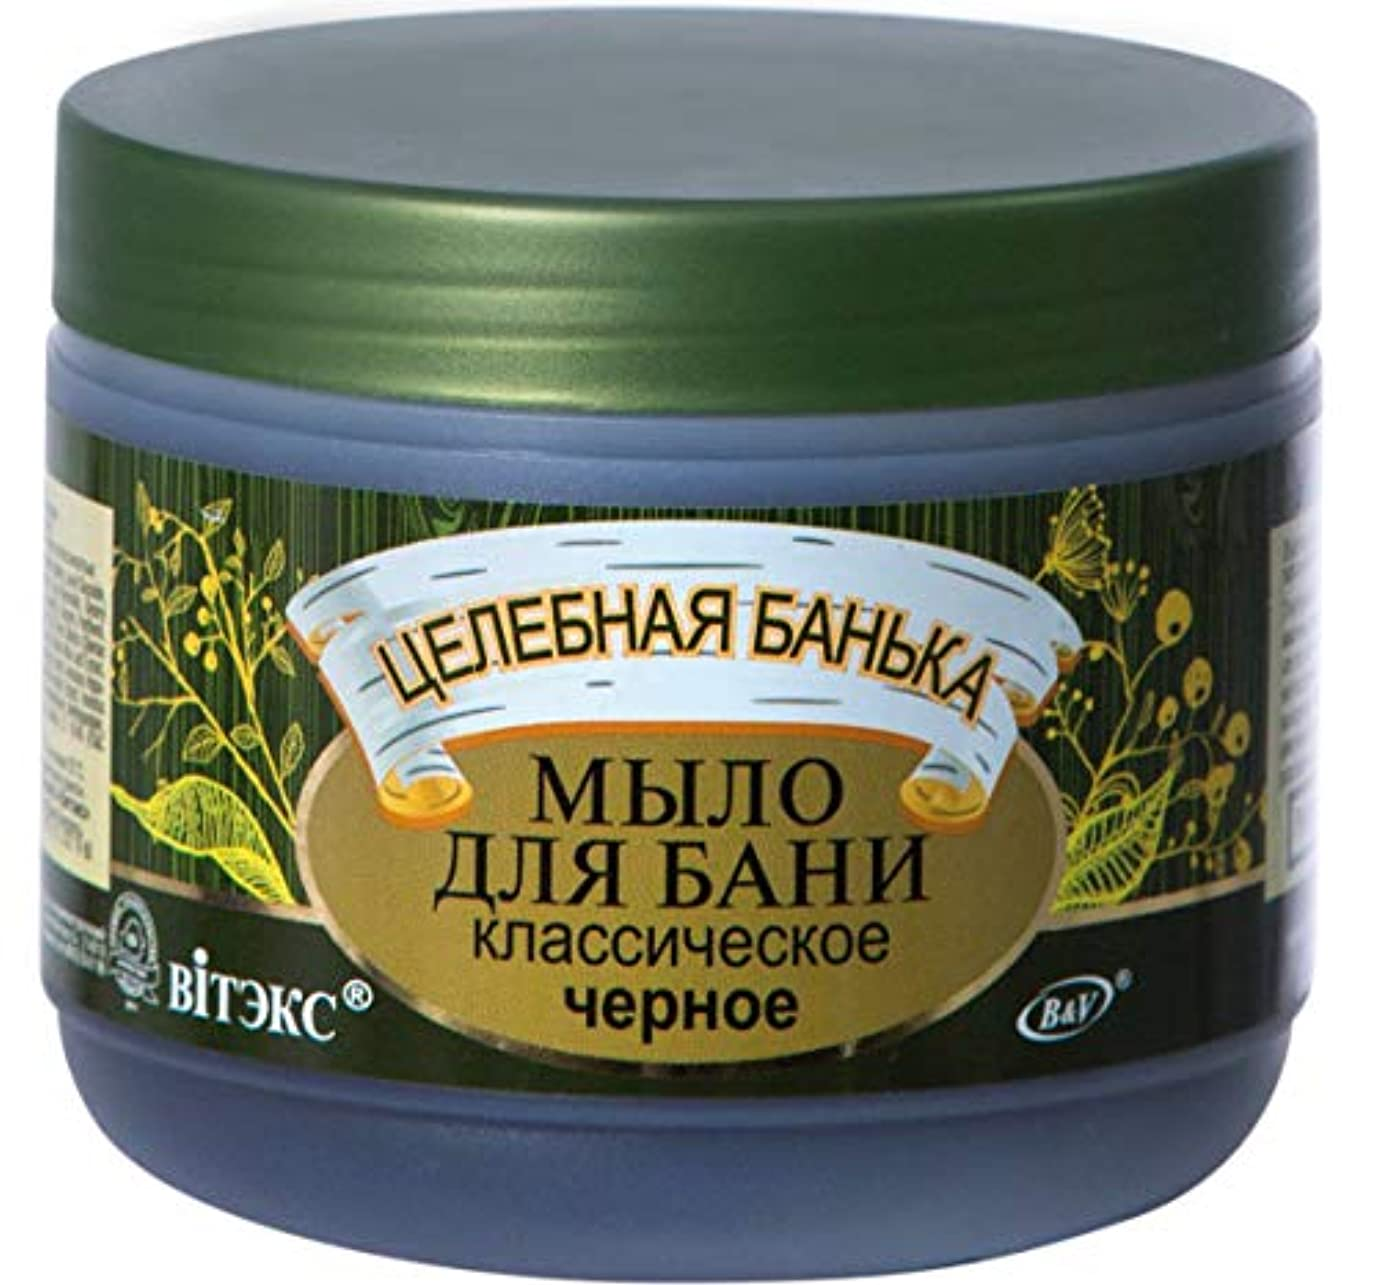 BIELITA & VITEX | Healing Bath | Classic Black Soap with 7 Natural Extracts